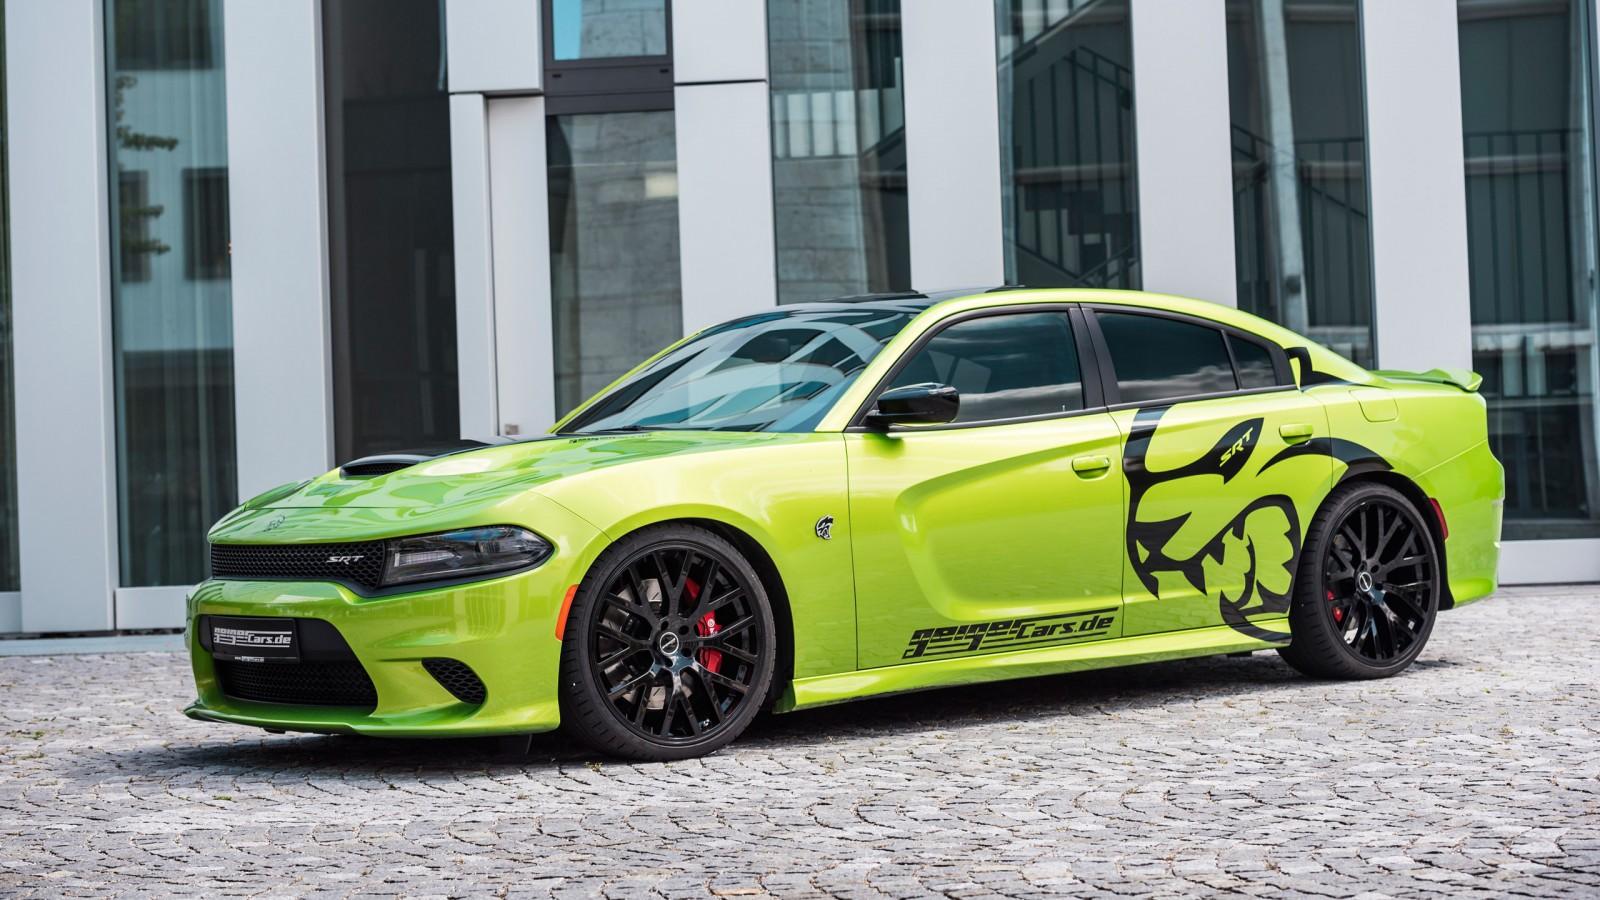 Charger Srt Hellcat >> 2016 Geigercars Dodge Charger SRT Hellcat Wallpaper | HD ...